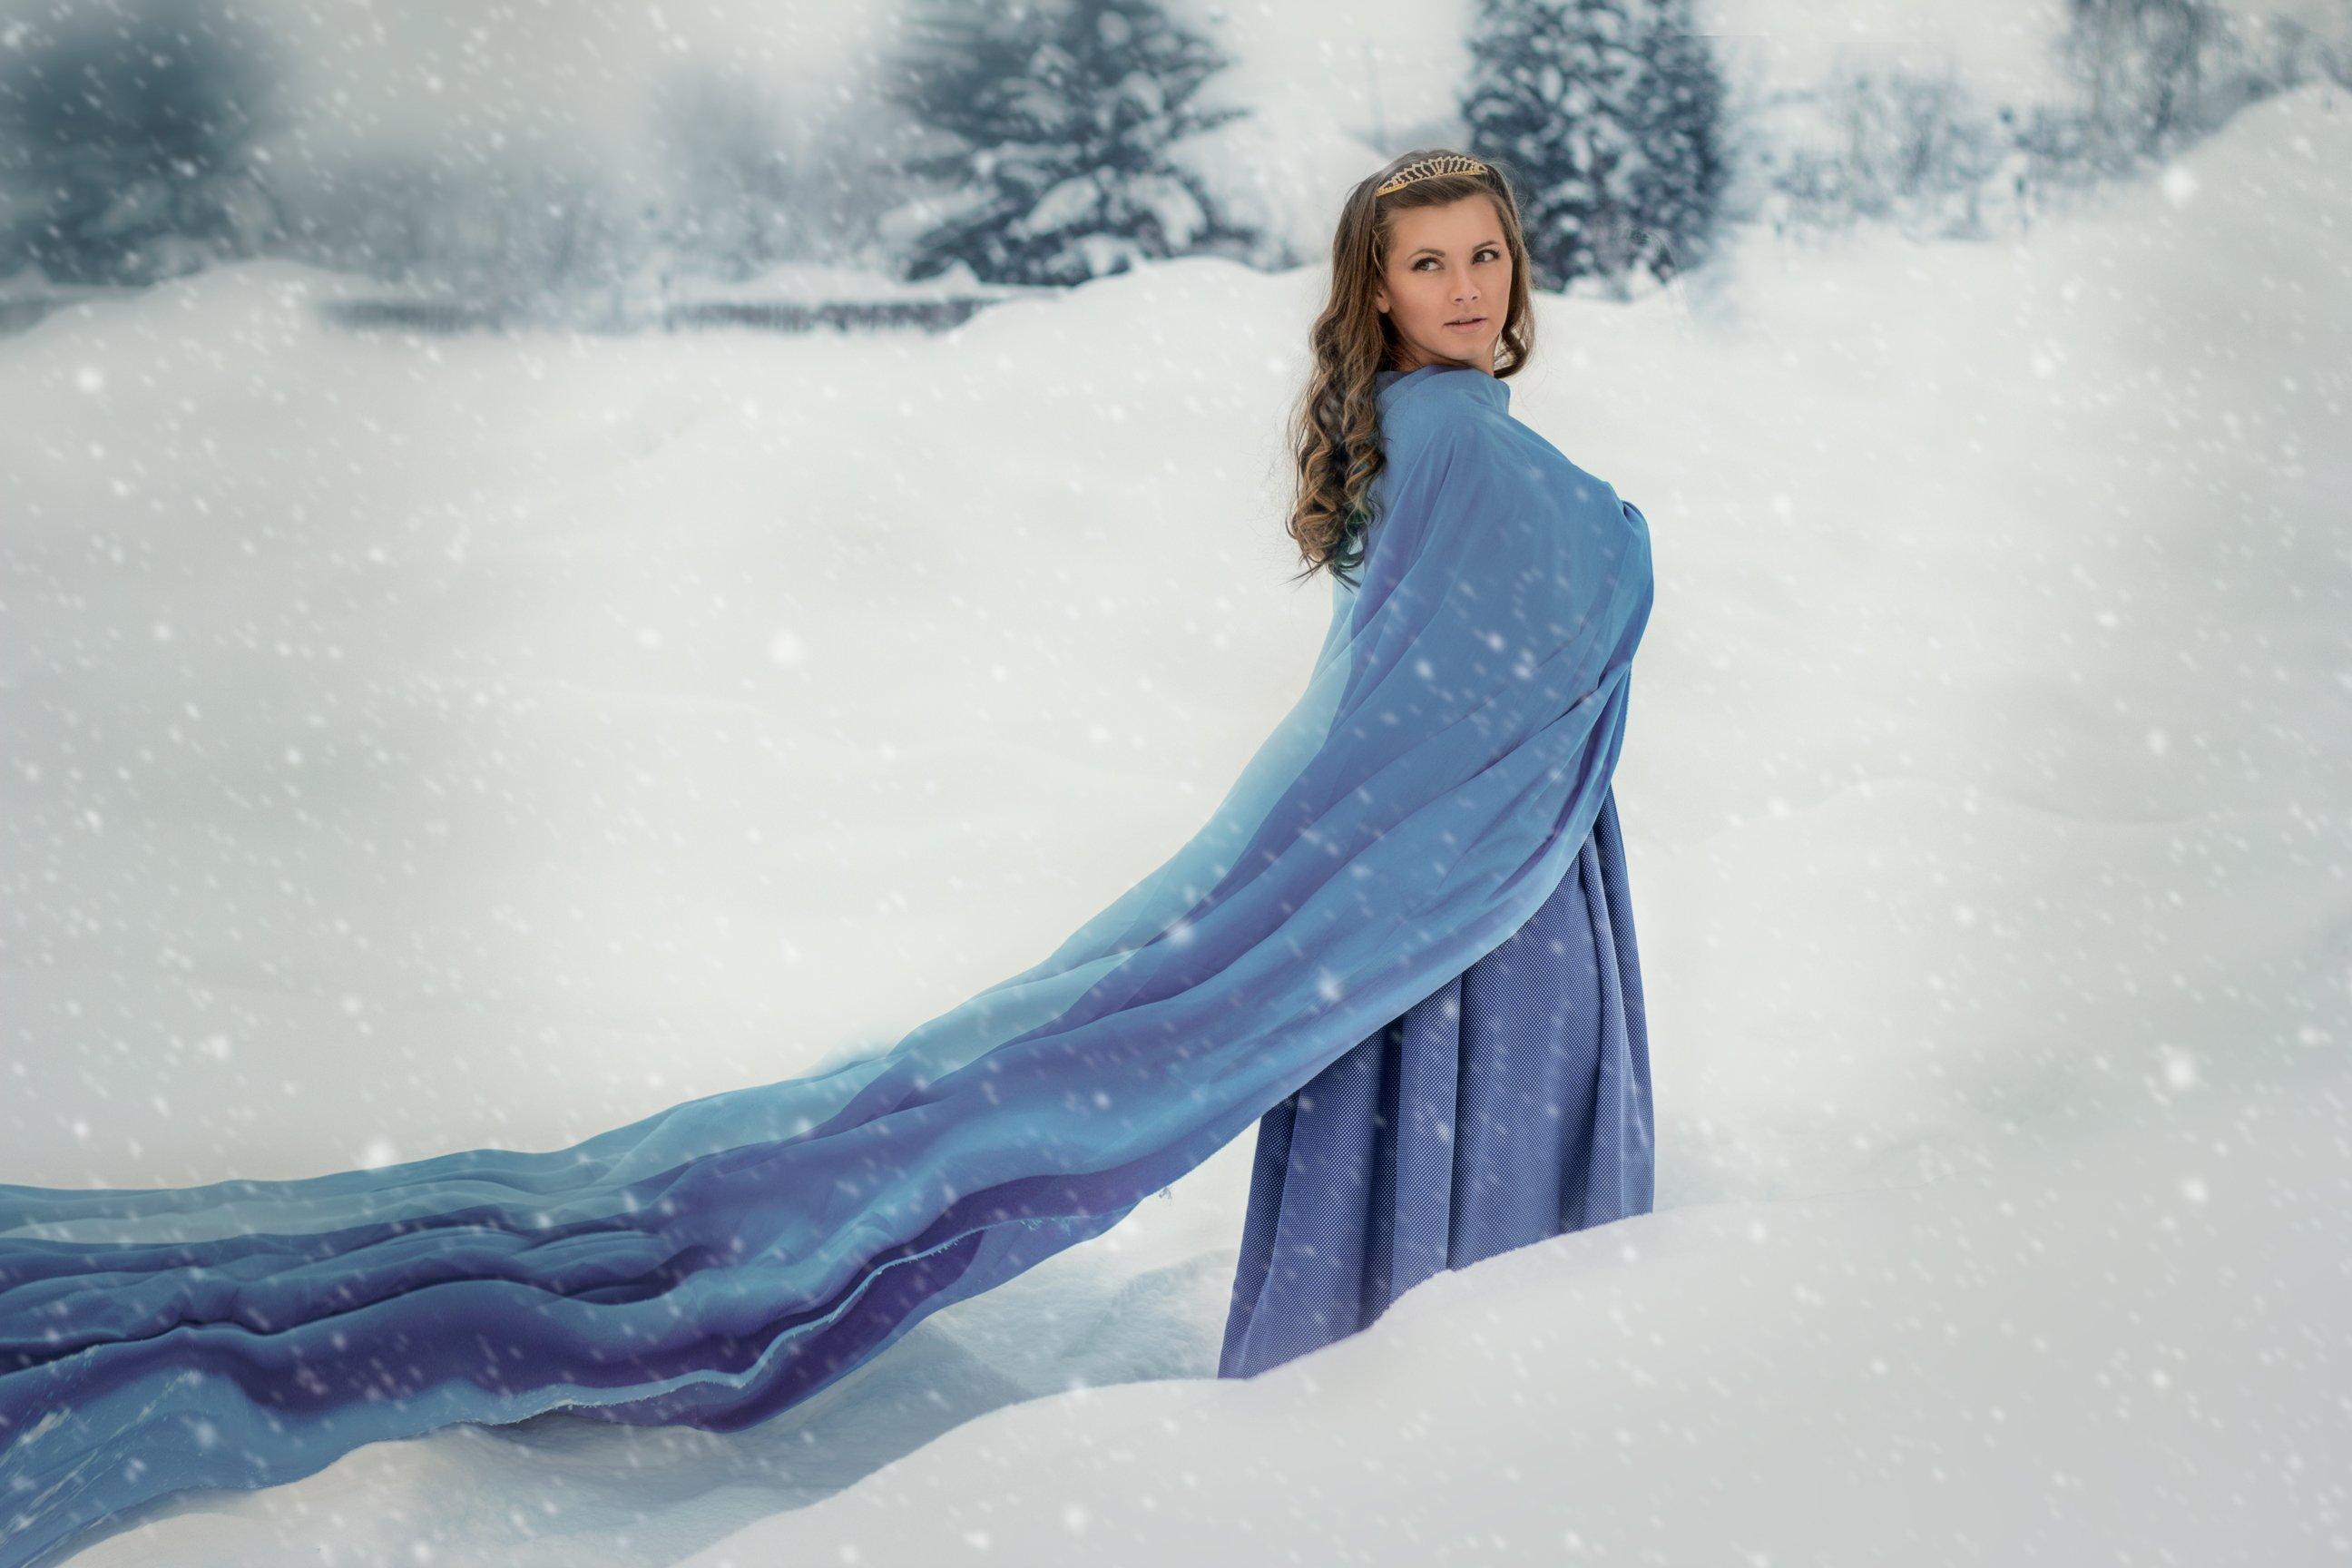 girl, snow, snowwhite, queen, look, beauty, Виноградова Анастасия